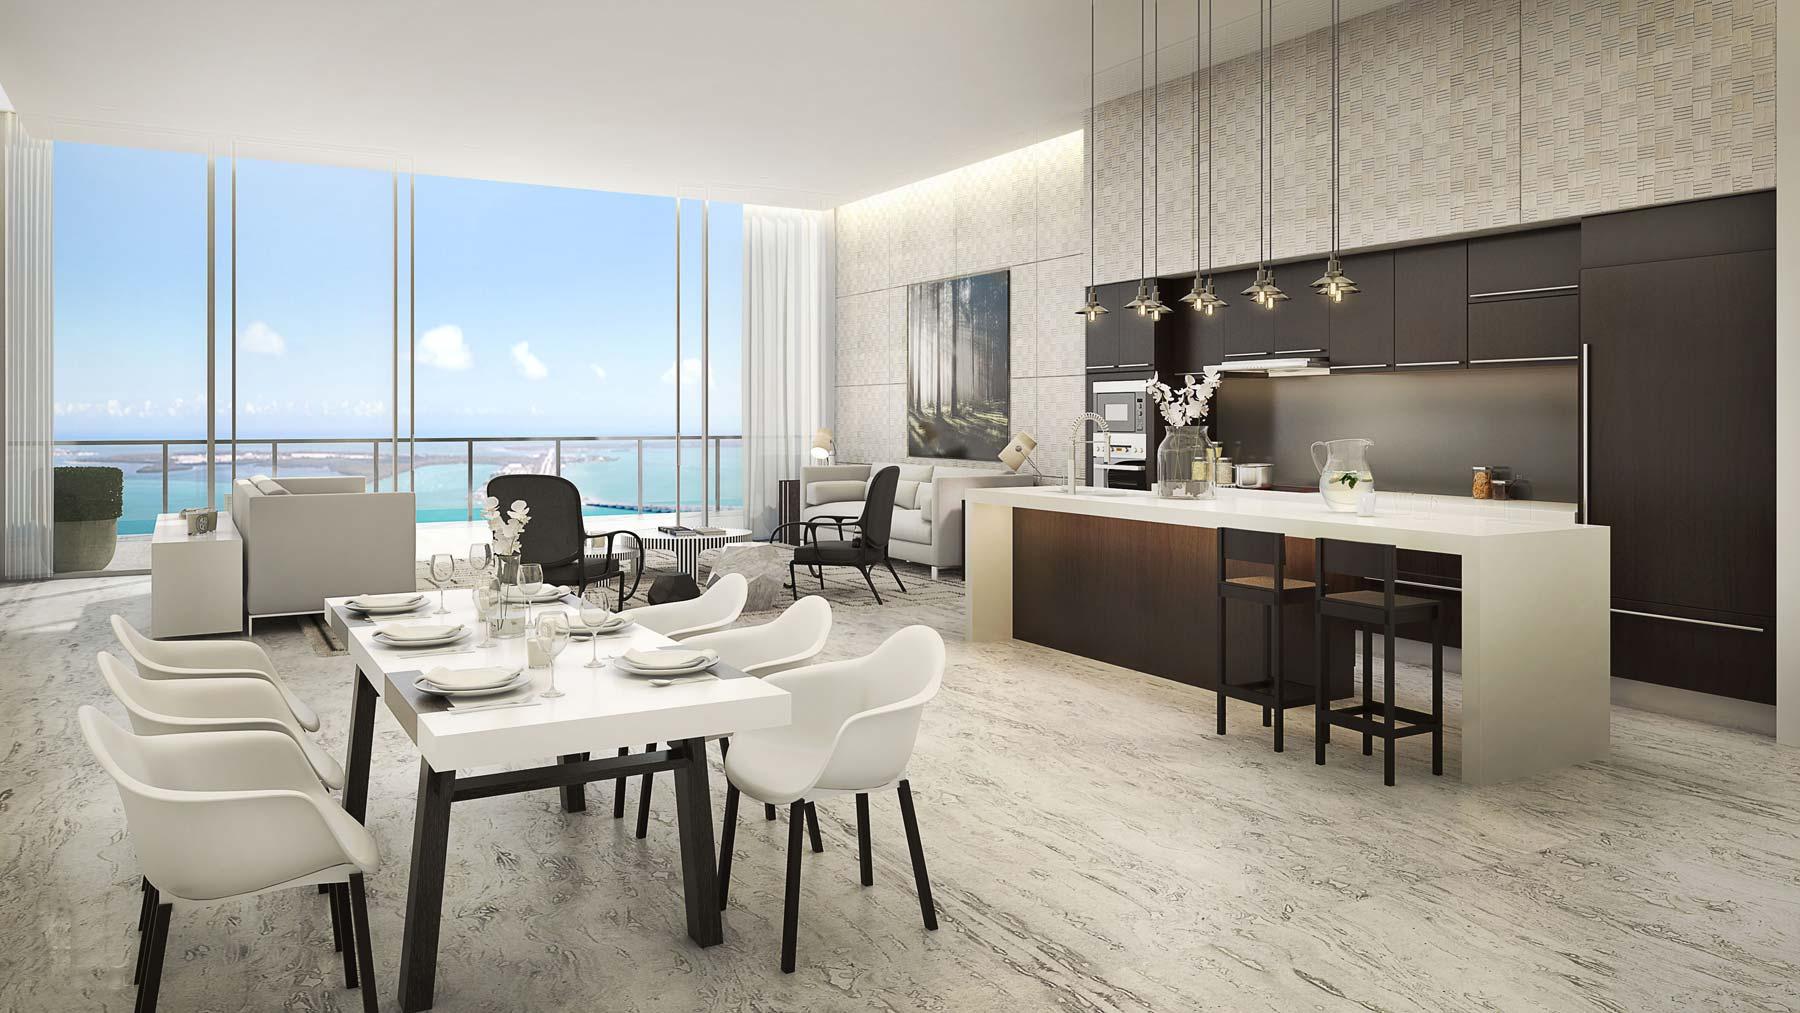 Luxury Condo Apartments in Miami Florida Beachfront Condos